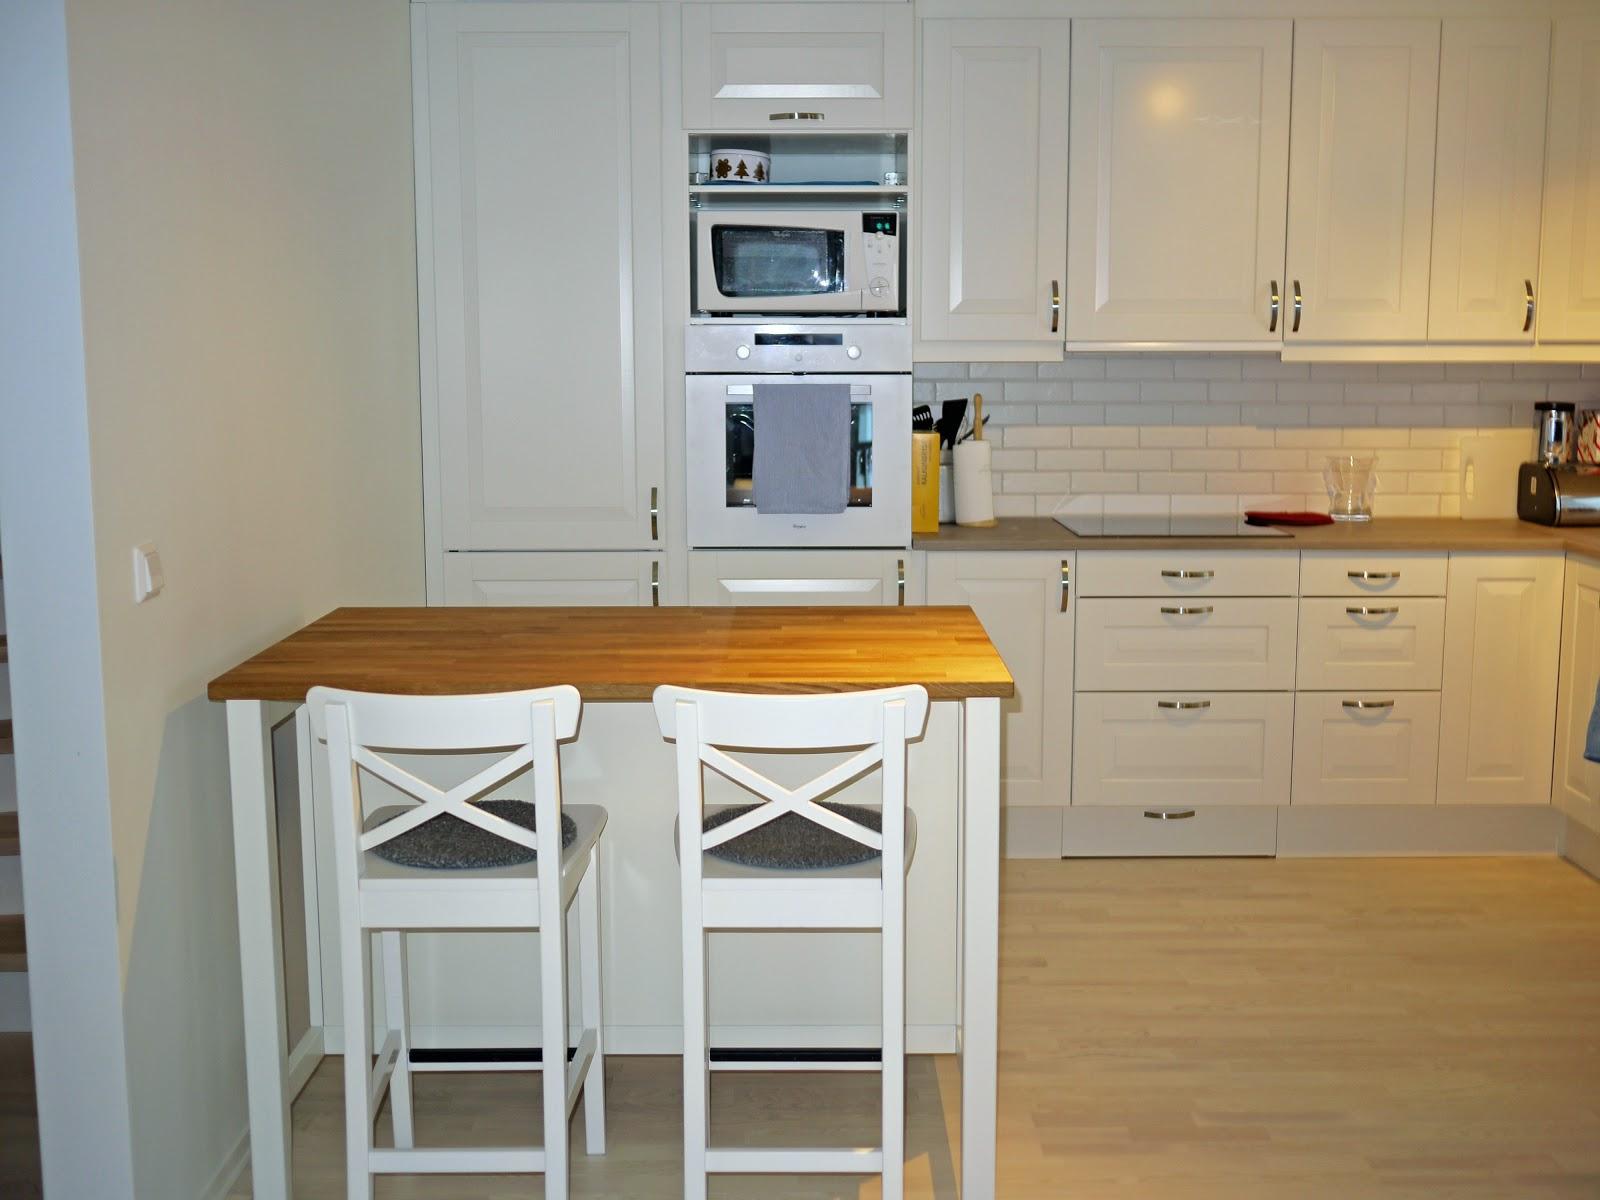 Ikea kj kken y materialvalg for baderomsm bler - Bancone da cucina ikea ...